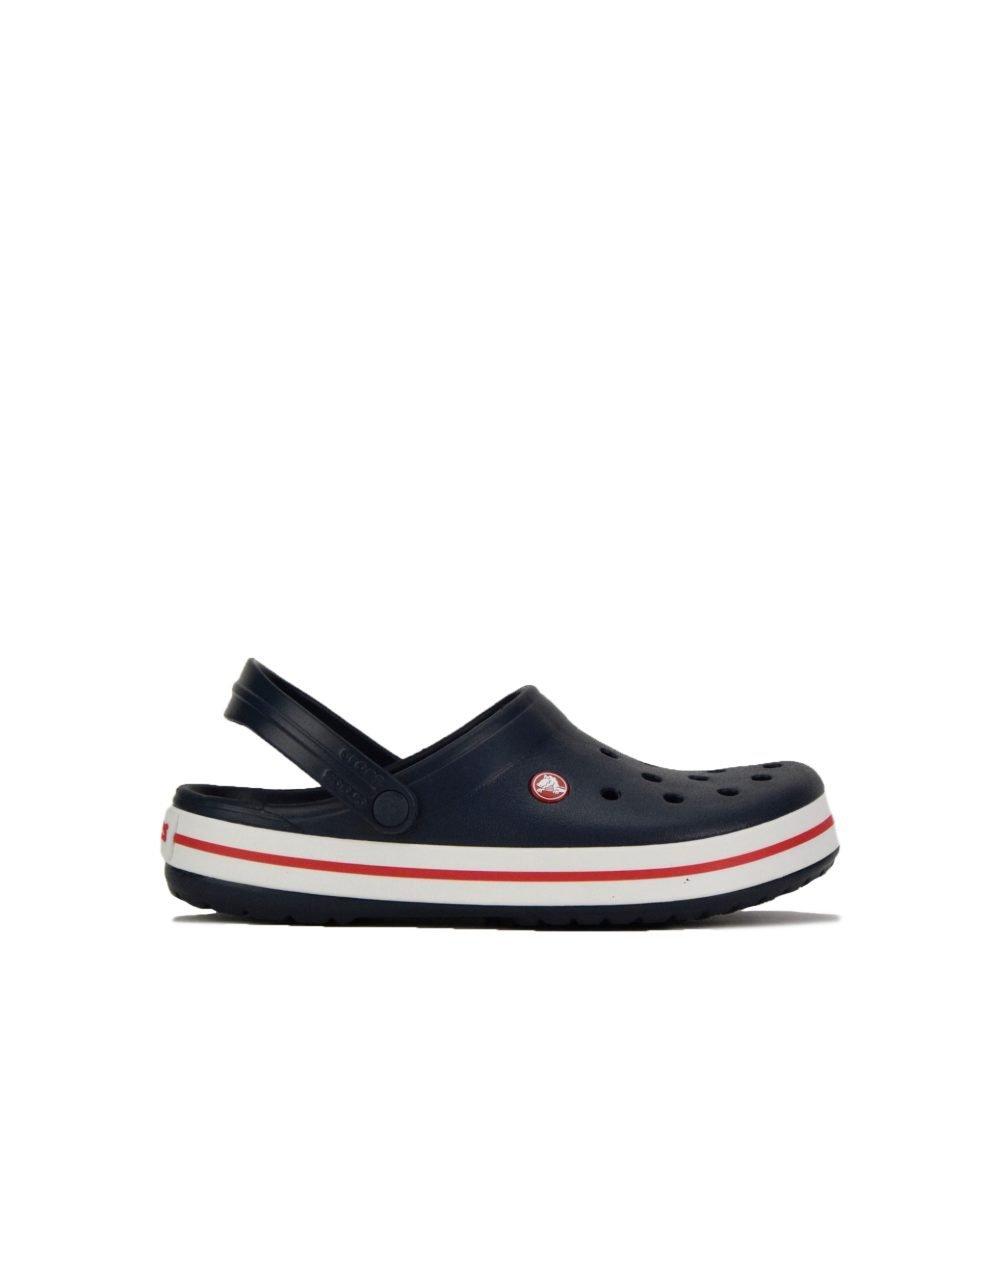 Crocs Crocband (11016-410) Navy